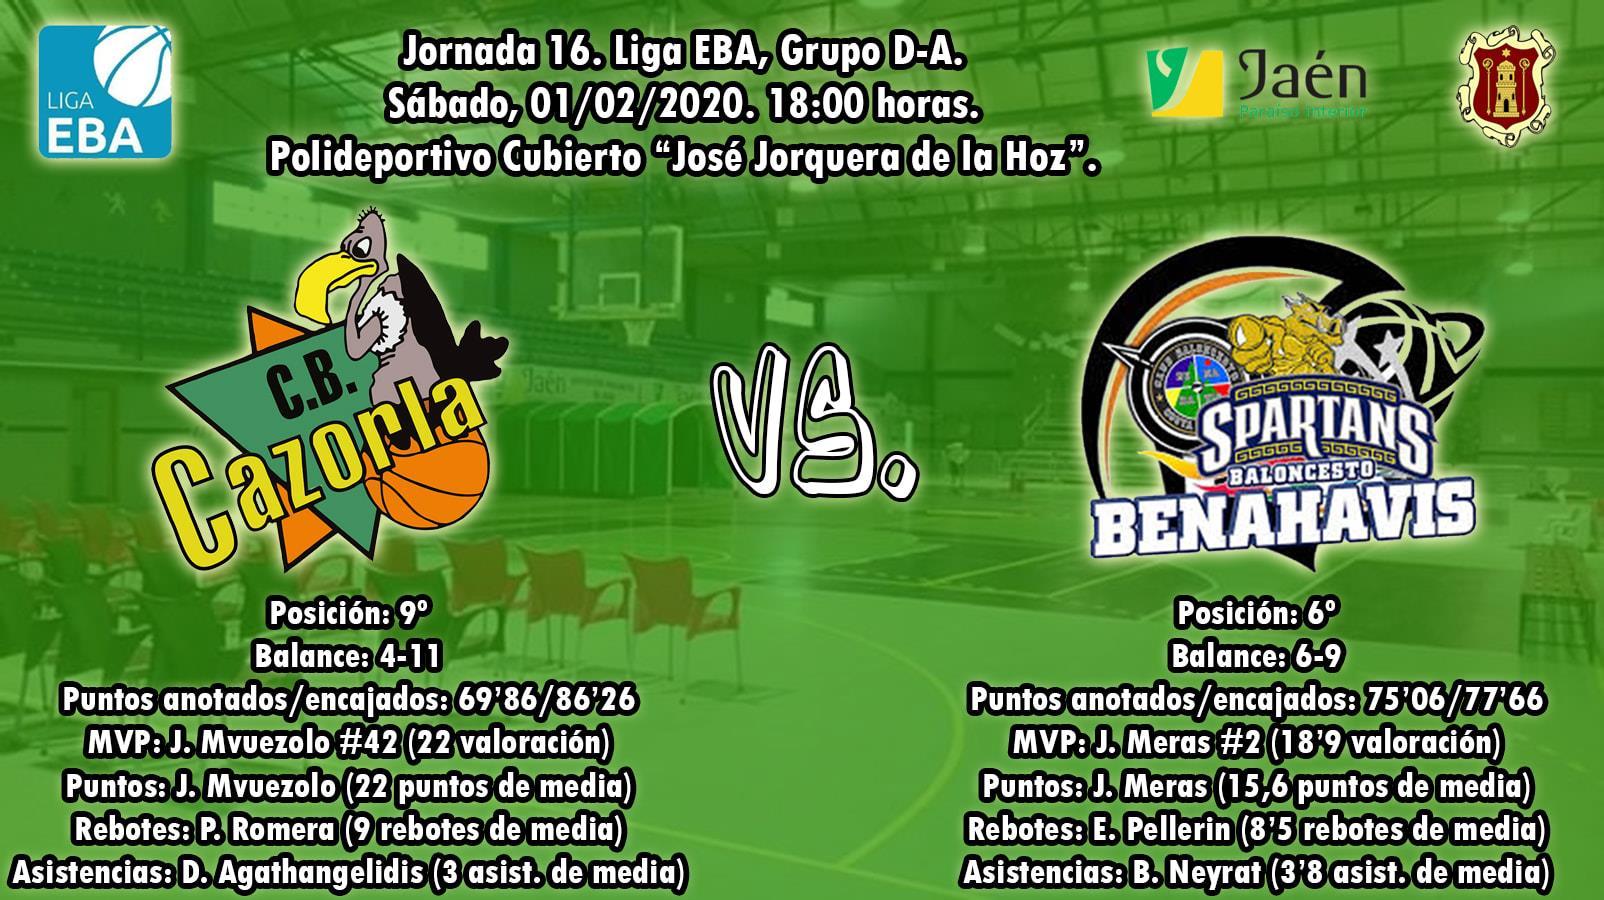 PREVIA   EBA (D-A) 19/20   J-16ª > Jaén Paraiso Interior CB Cazorla vs CB Benahavís Costa del Sol